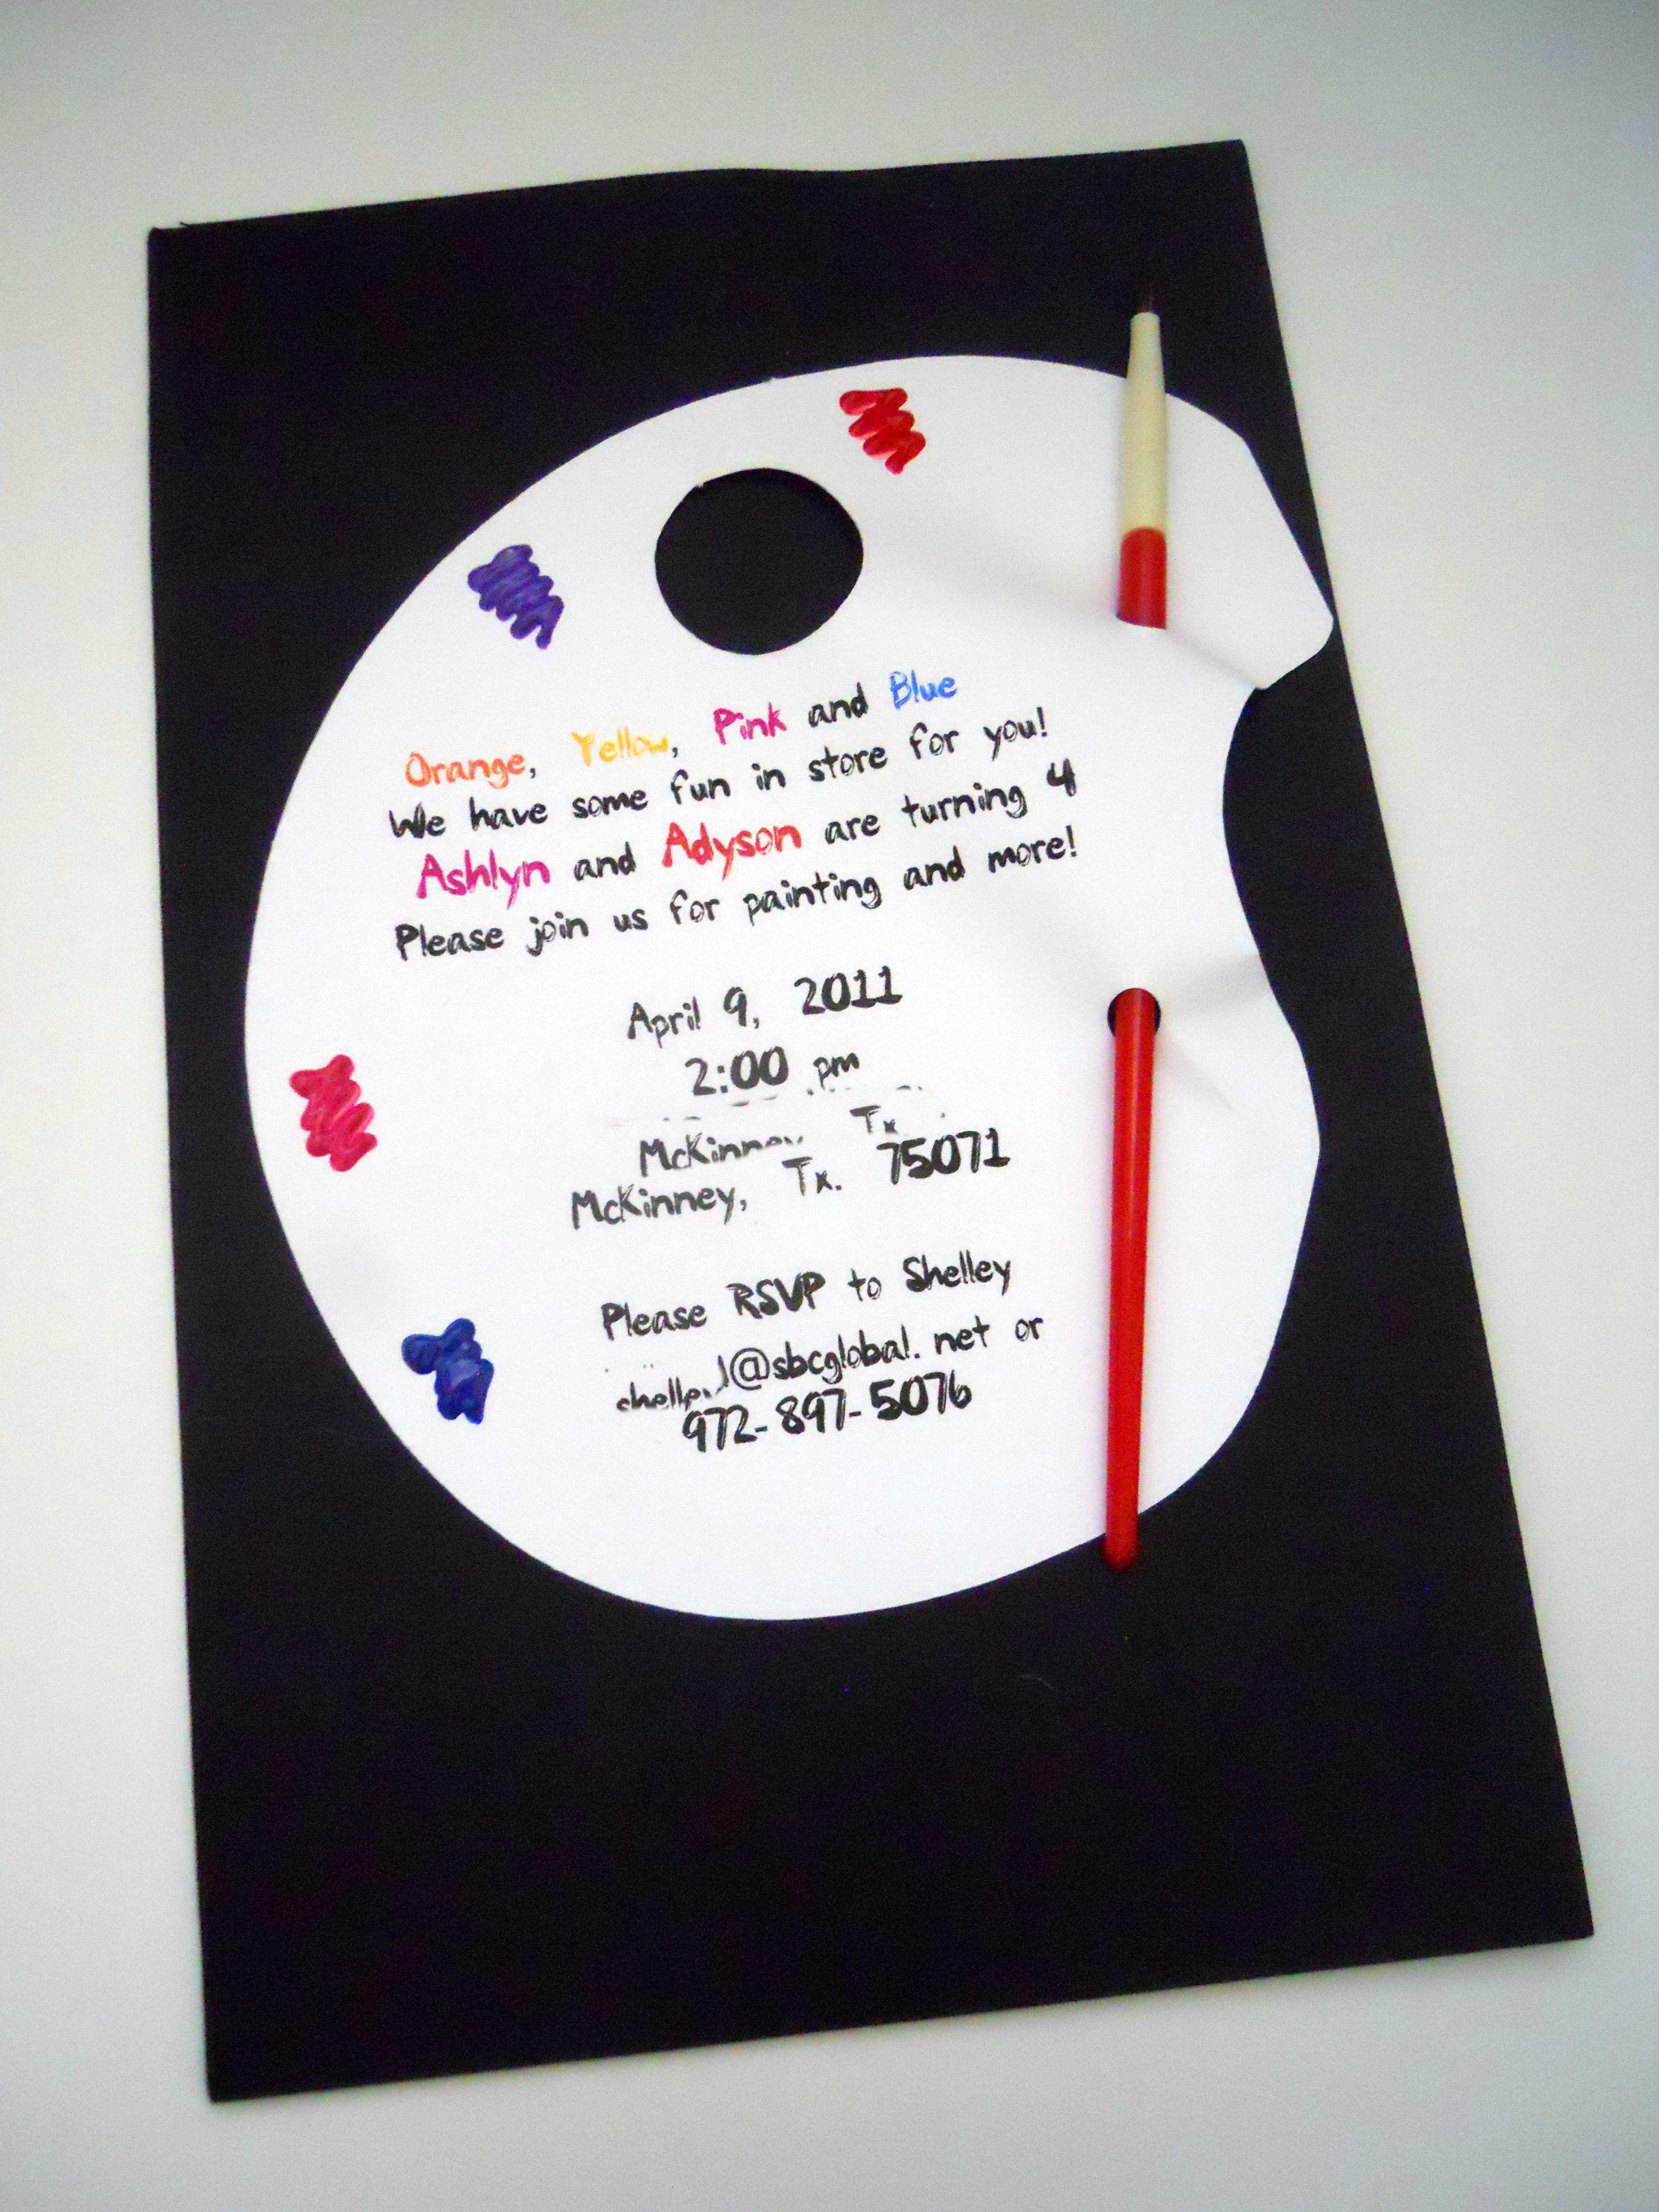 Paint Party Invitation | Paint Party | Pinterest | Paint party and ...